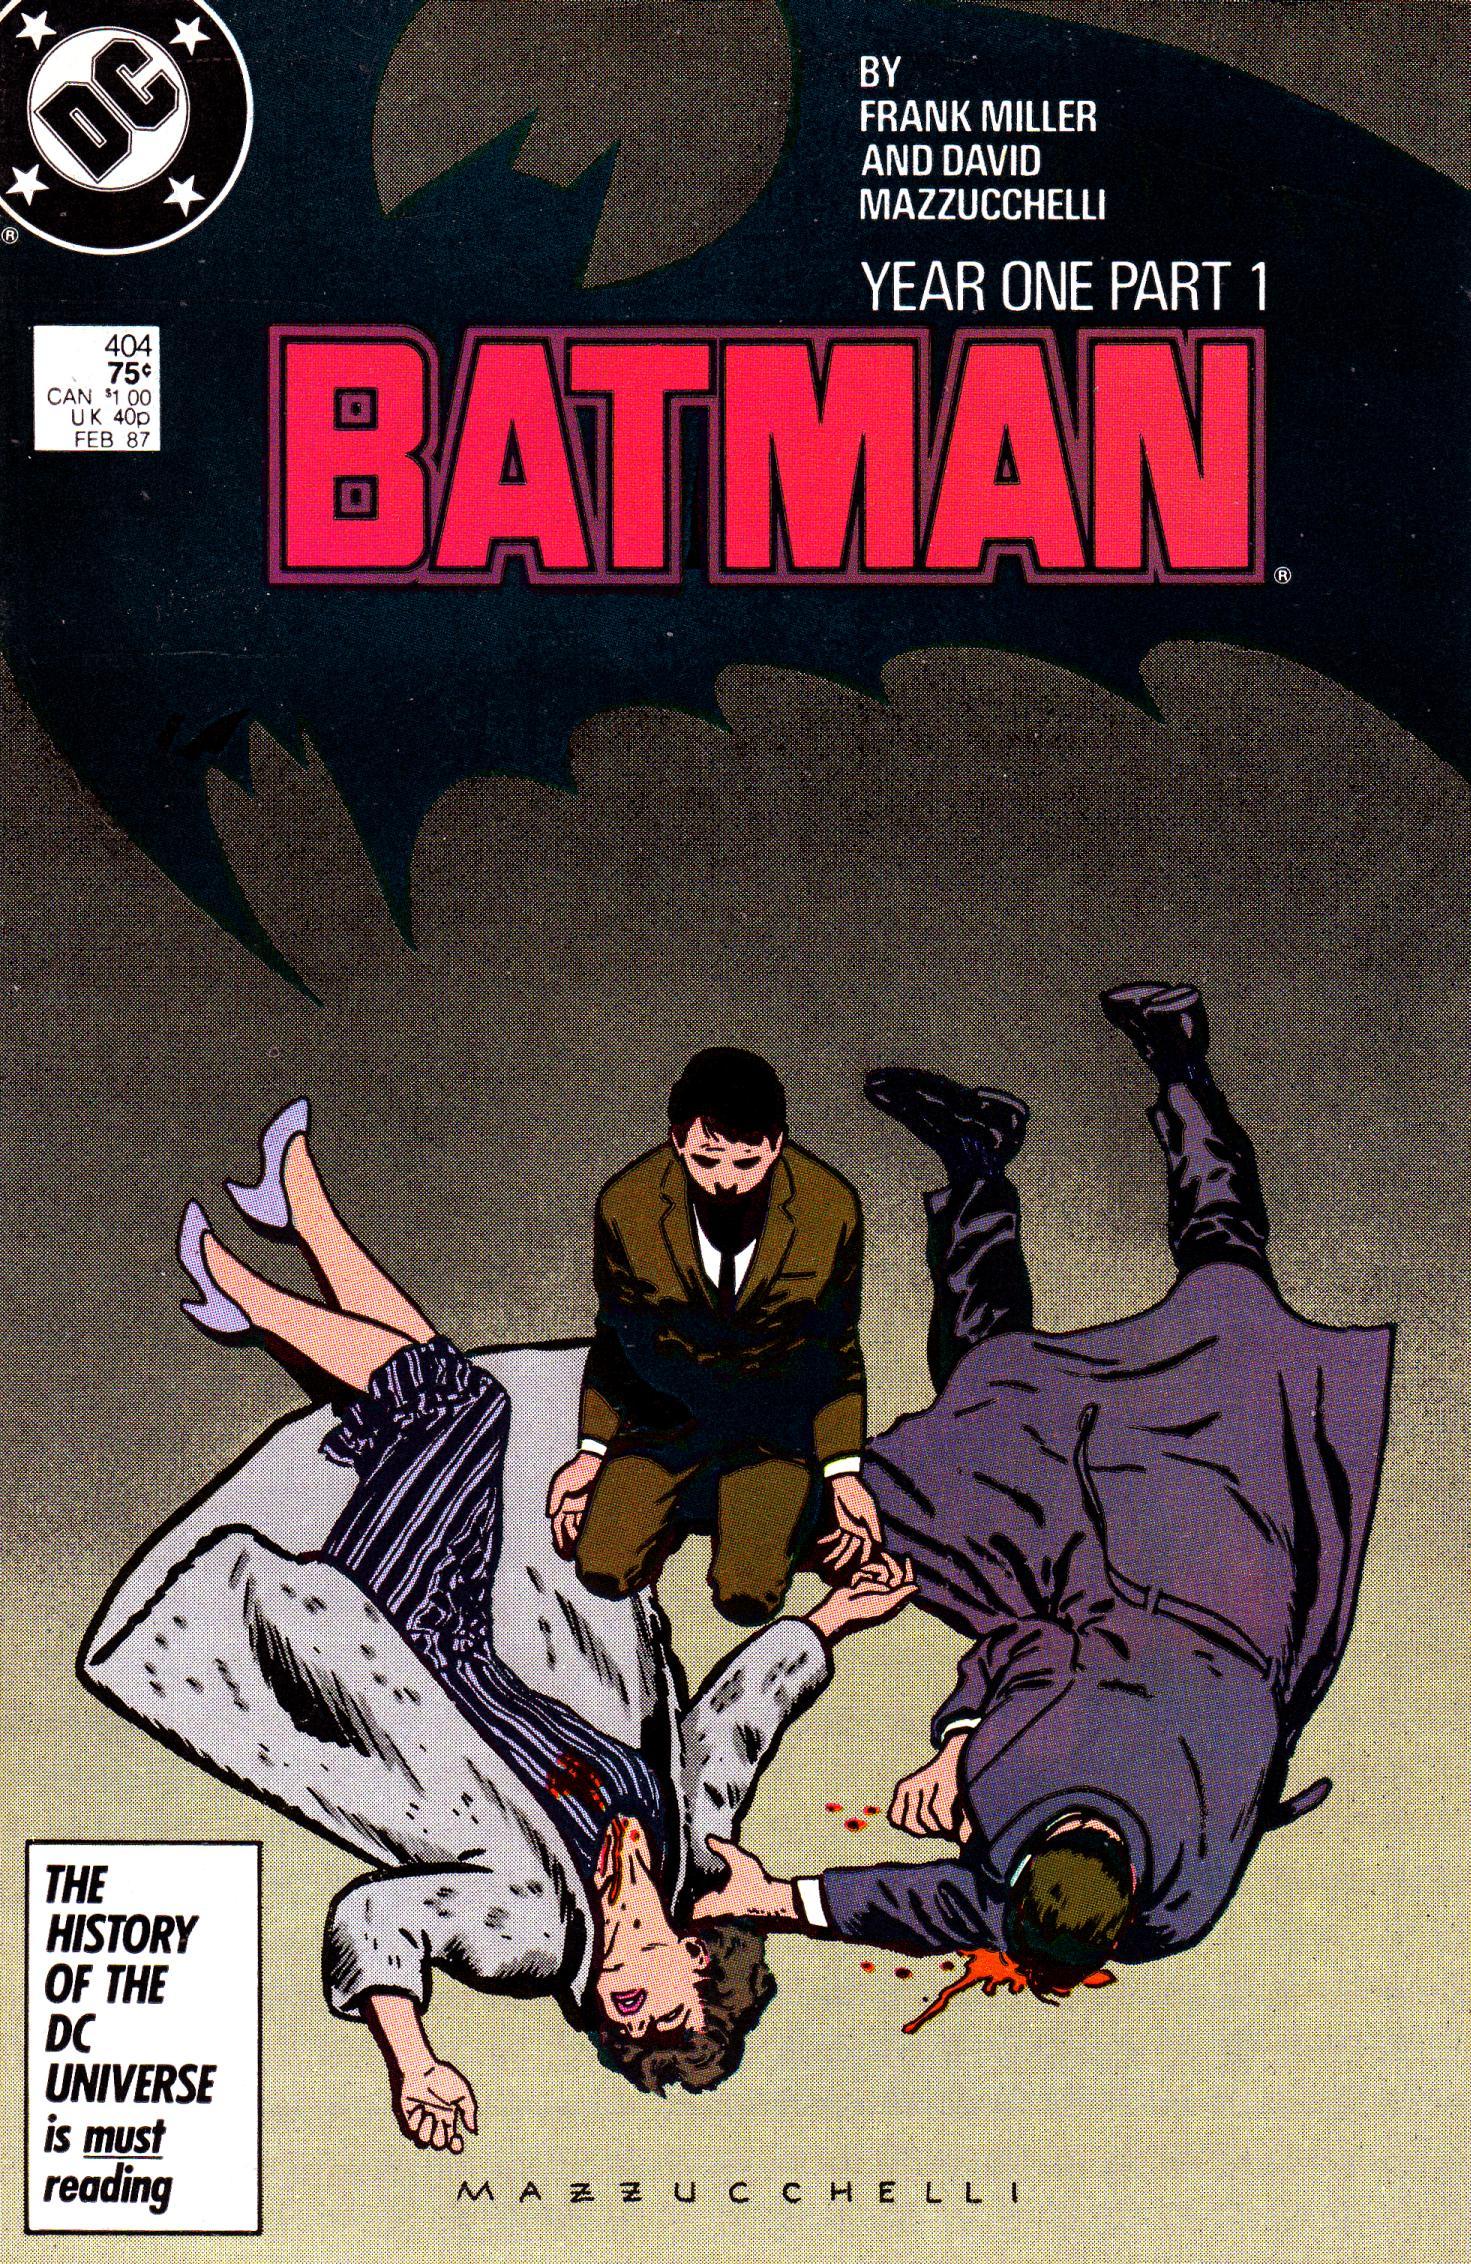 Frank Miller's First Encounter with Batman | Stormfields